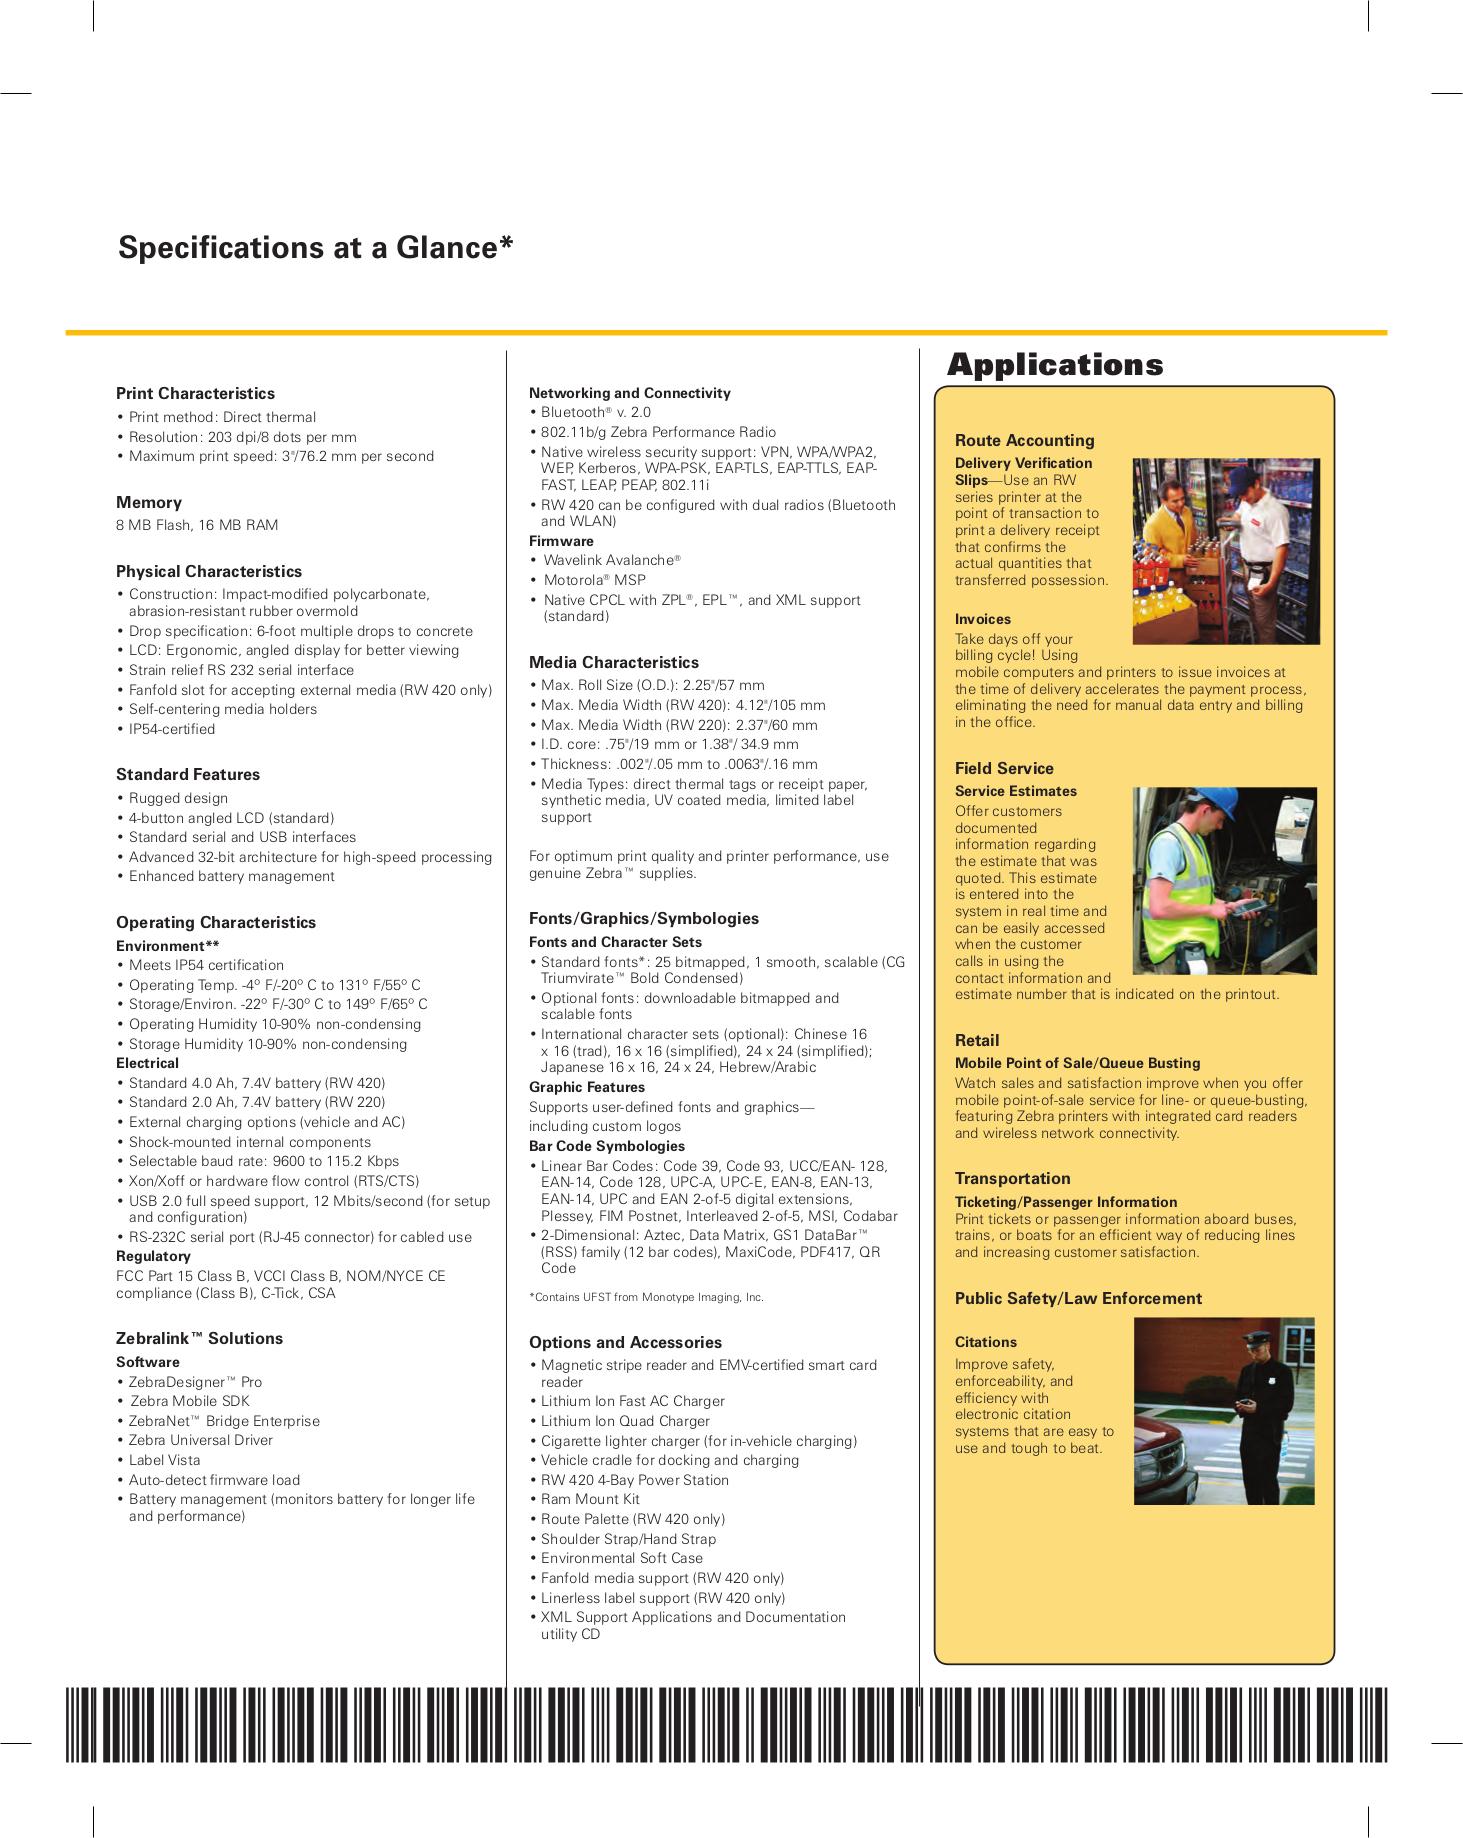 PDF manual for Zebra Printer RW420